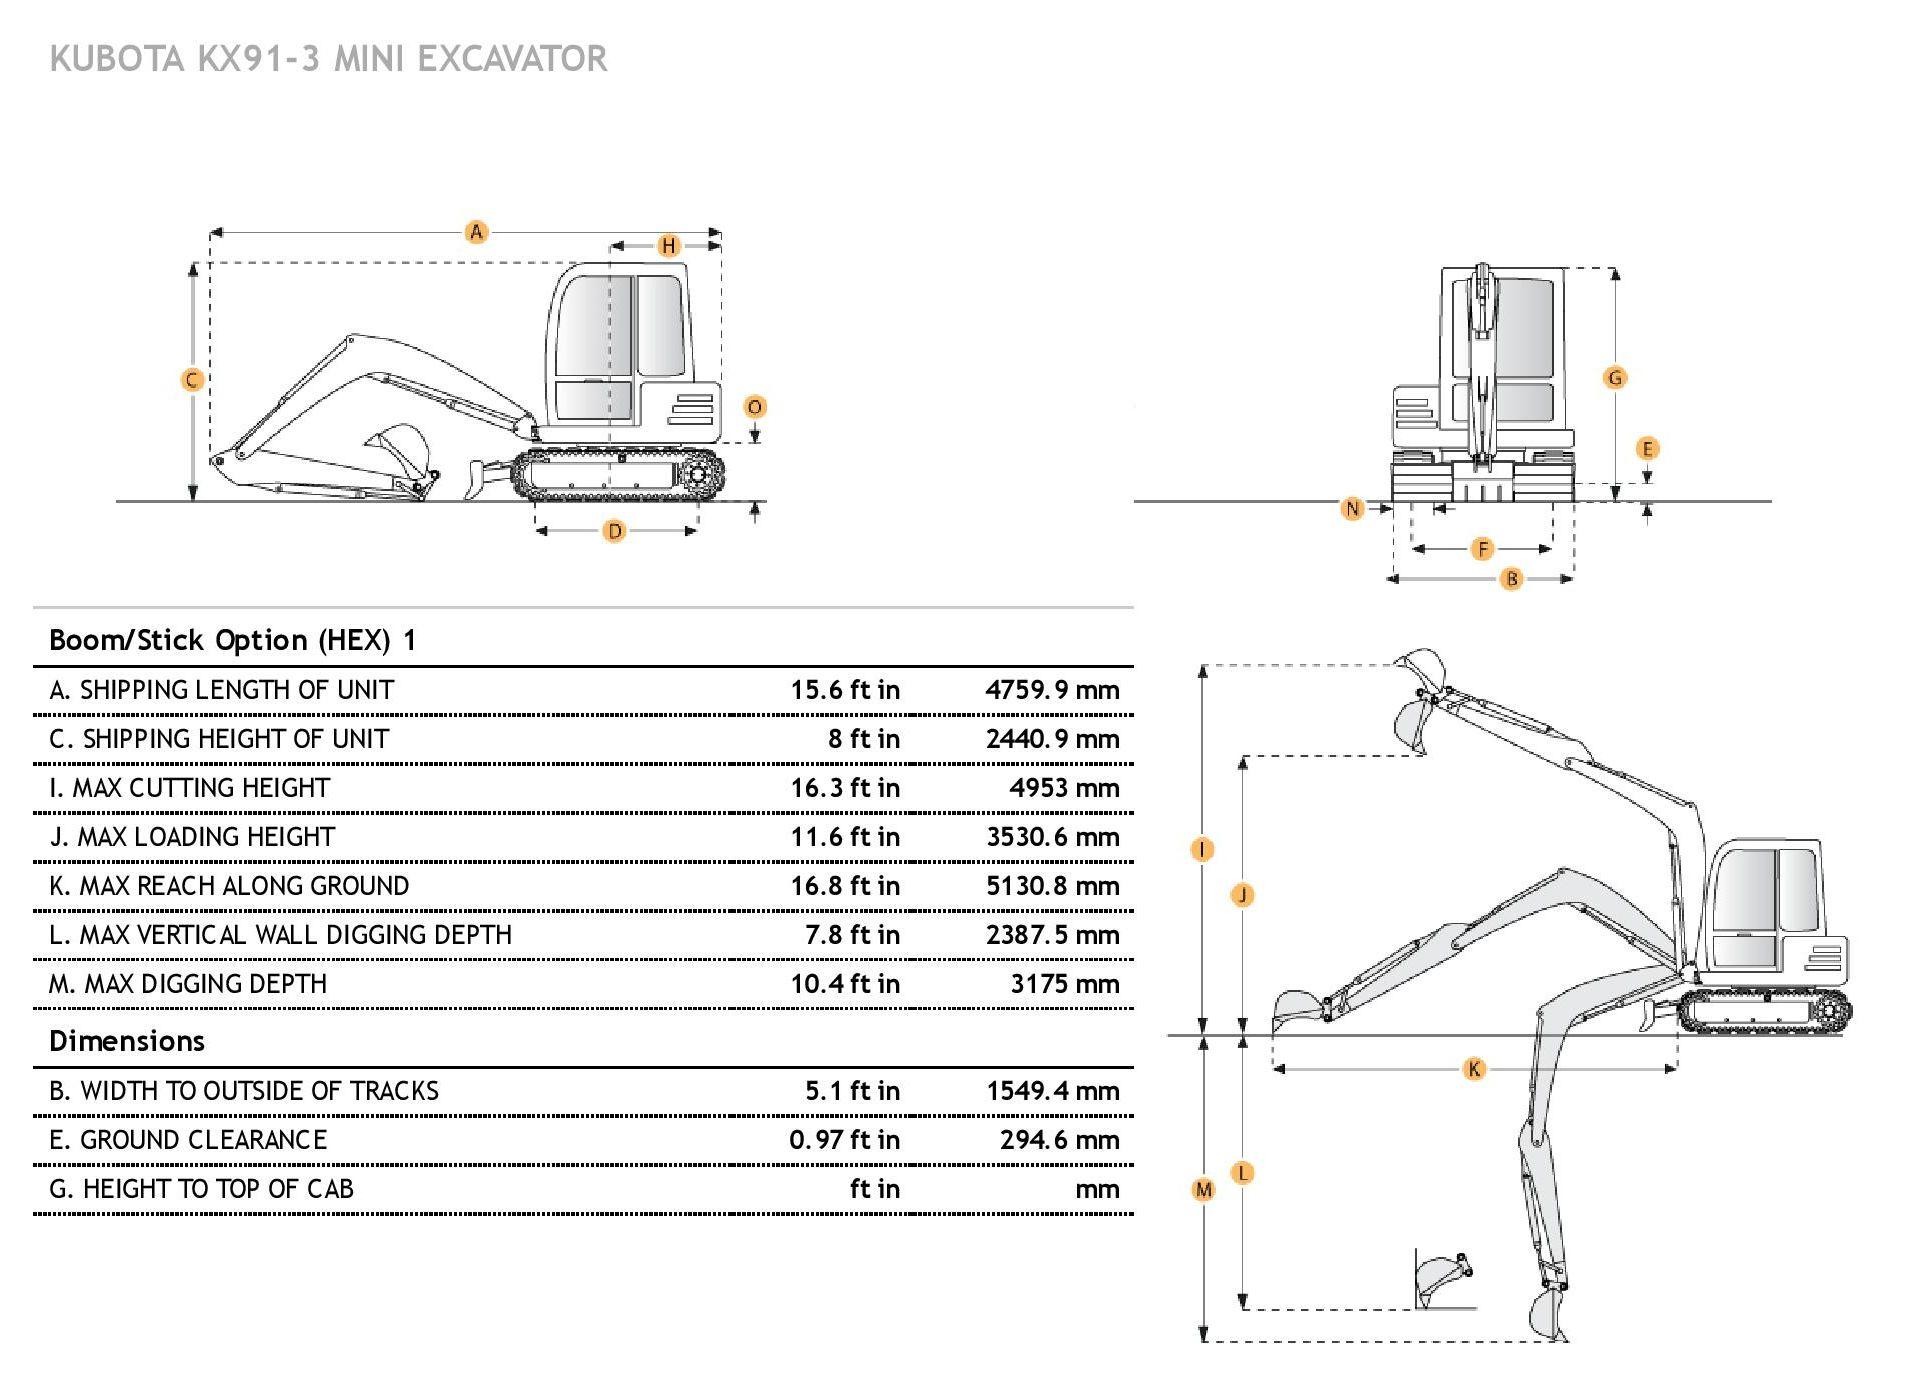 kubota excavator supplier worldwide